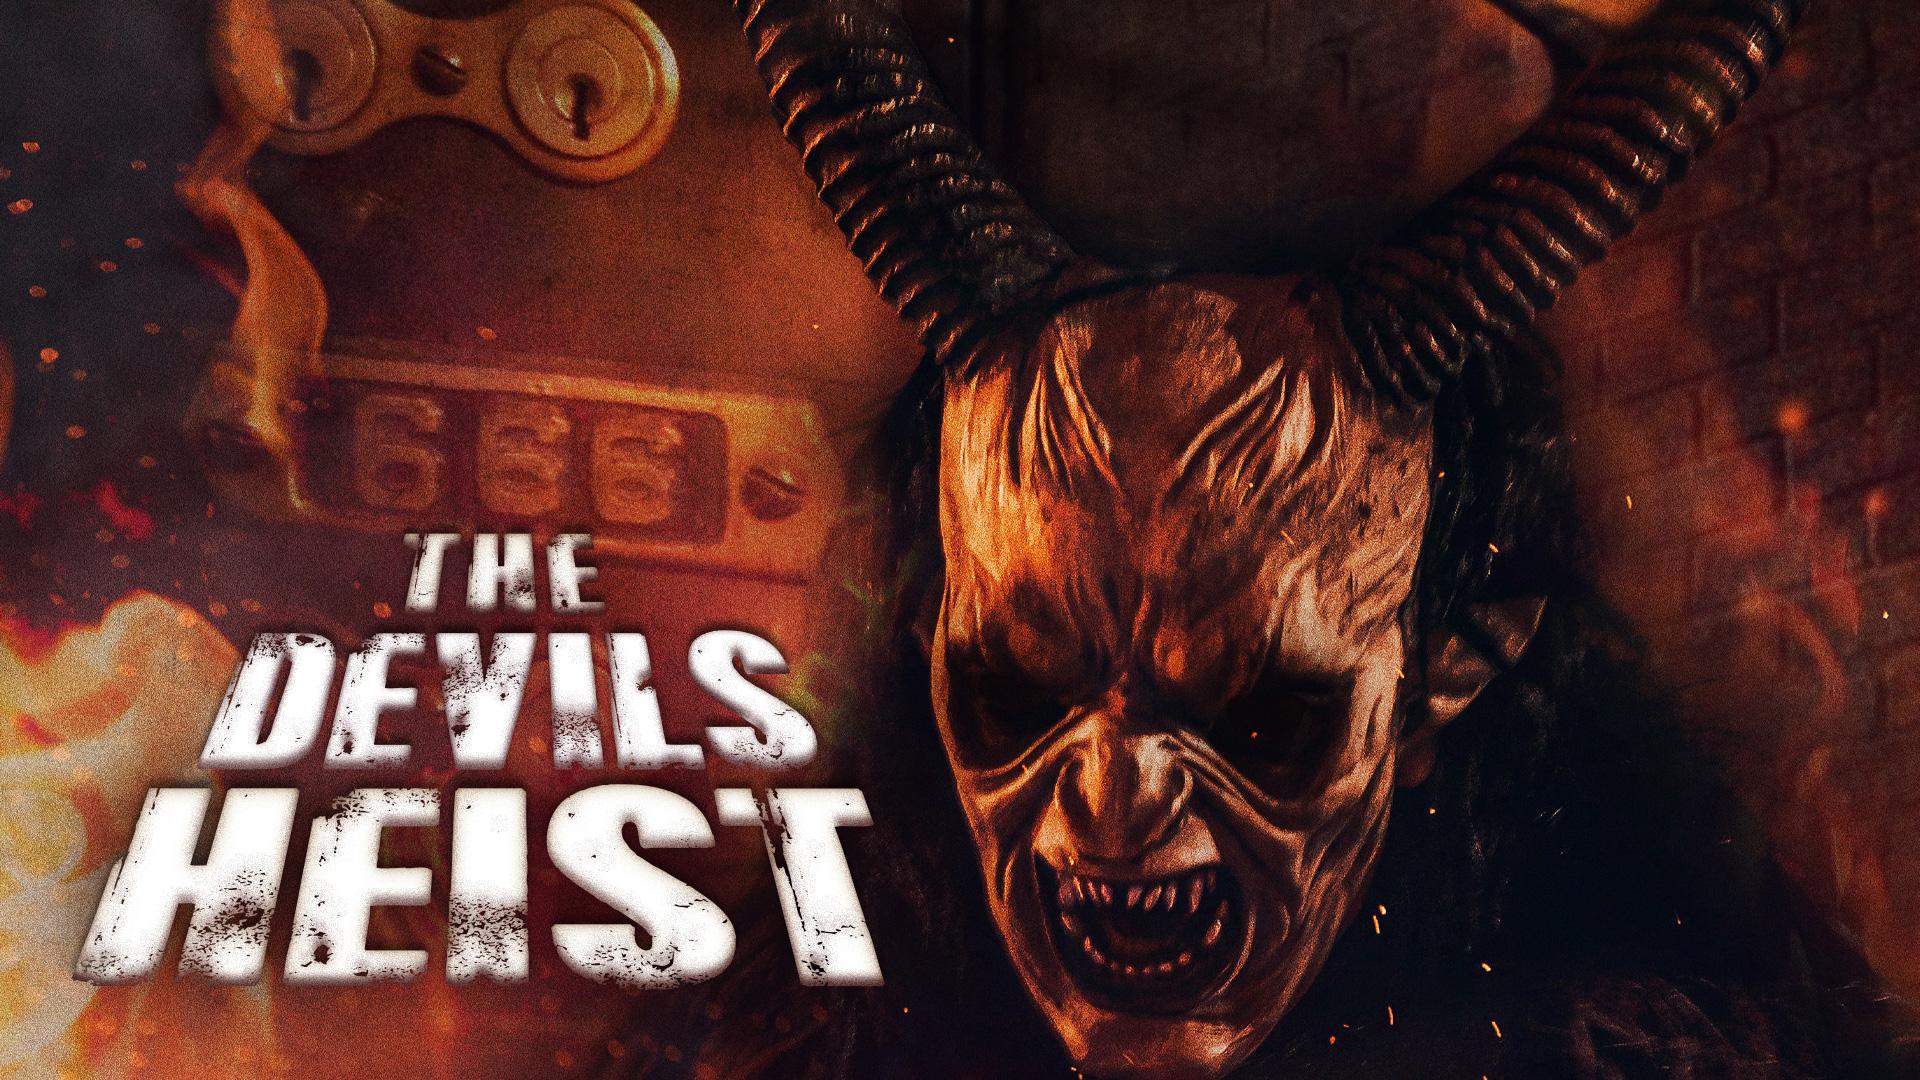 The Devil's Heist